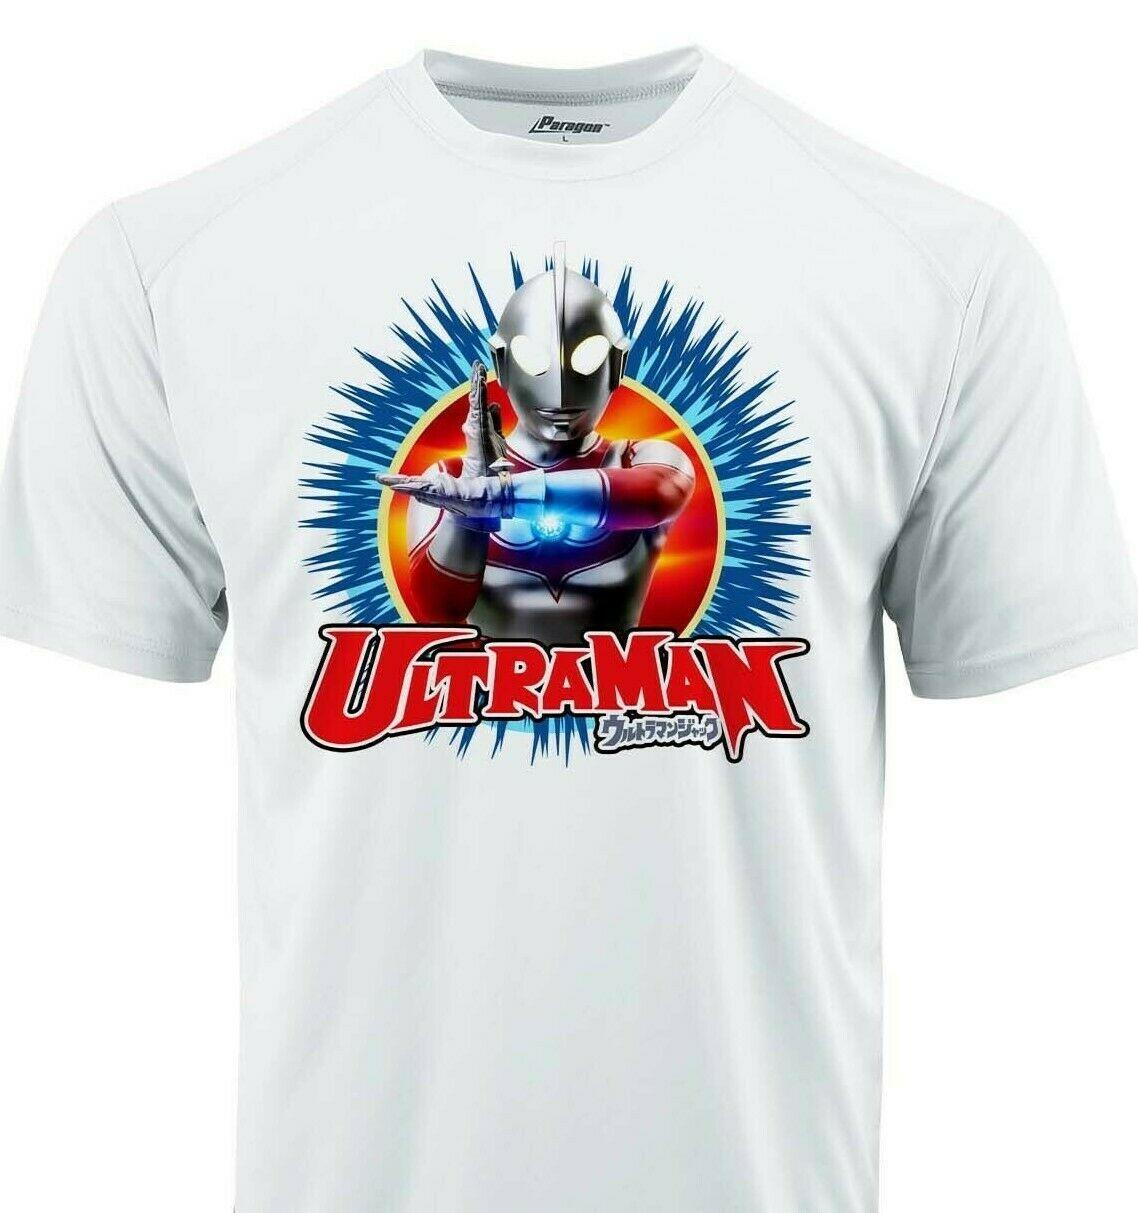 Ultraman II Dri Fit graphic Tshirt moisture wick SPF retro comic sport Sun Shirt